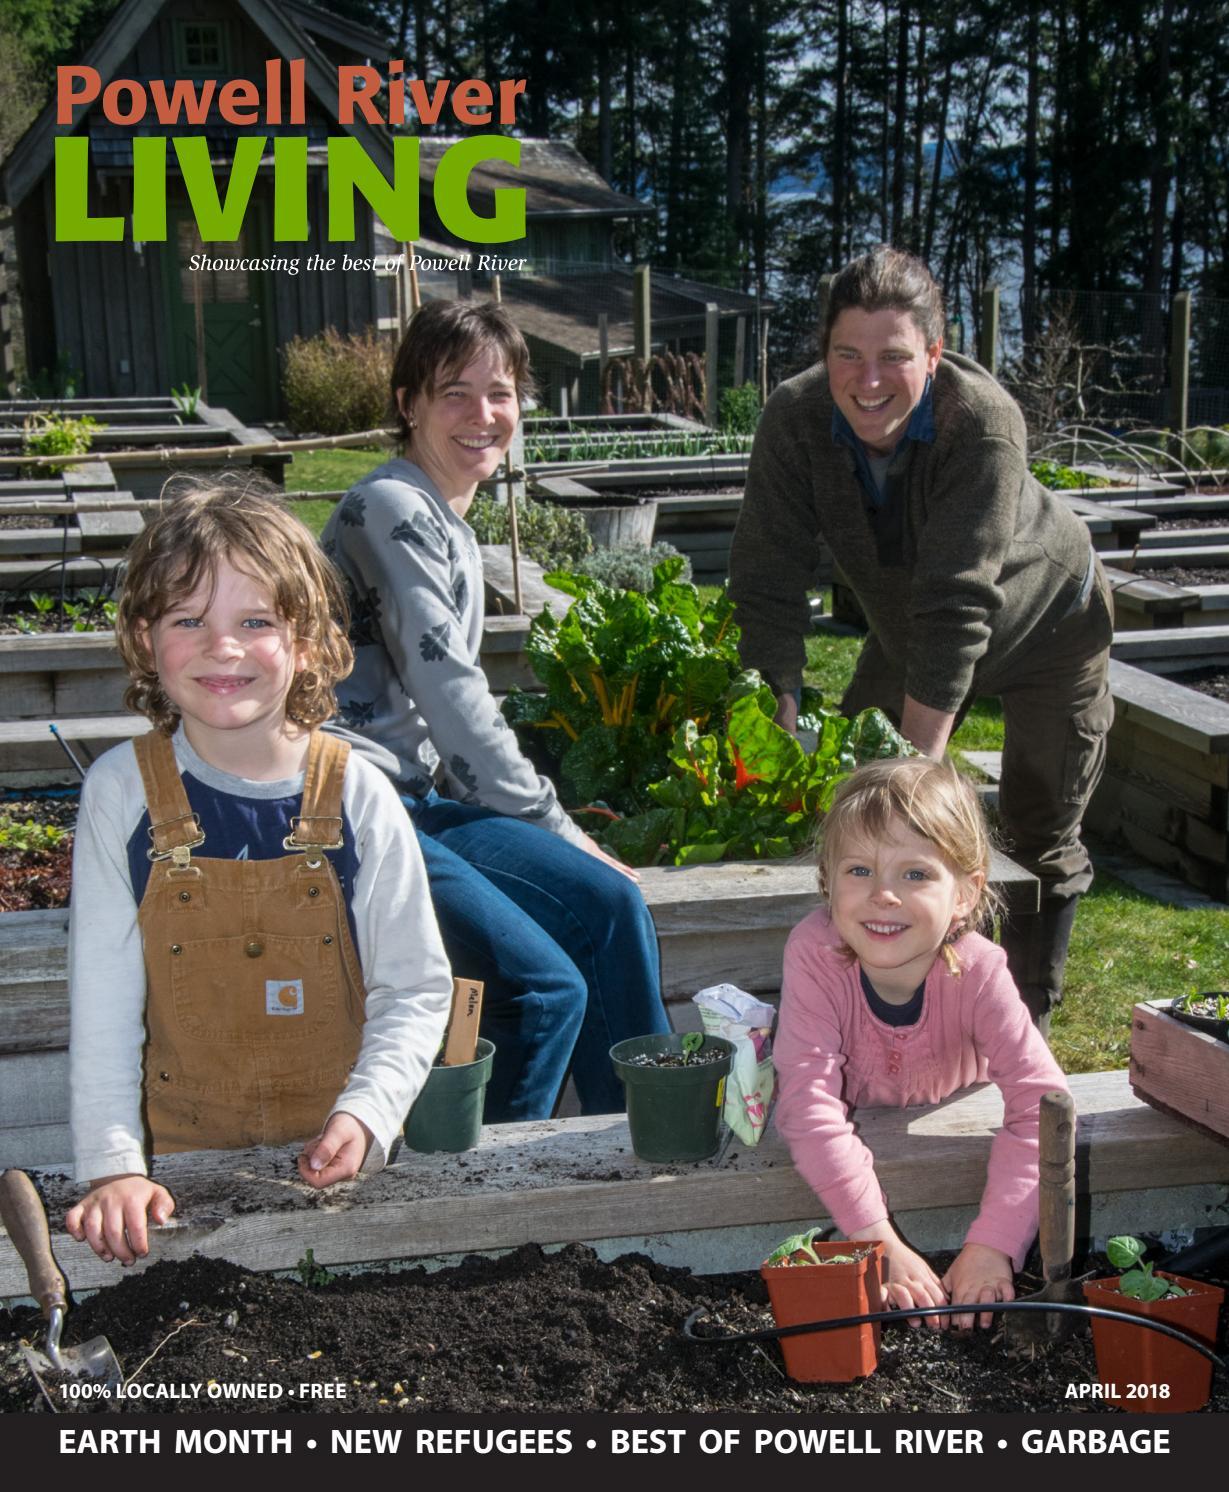 Powell River Living April 2018 by Sean Percy - issuu 2b3059efad8